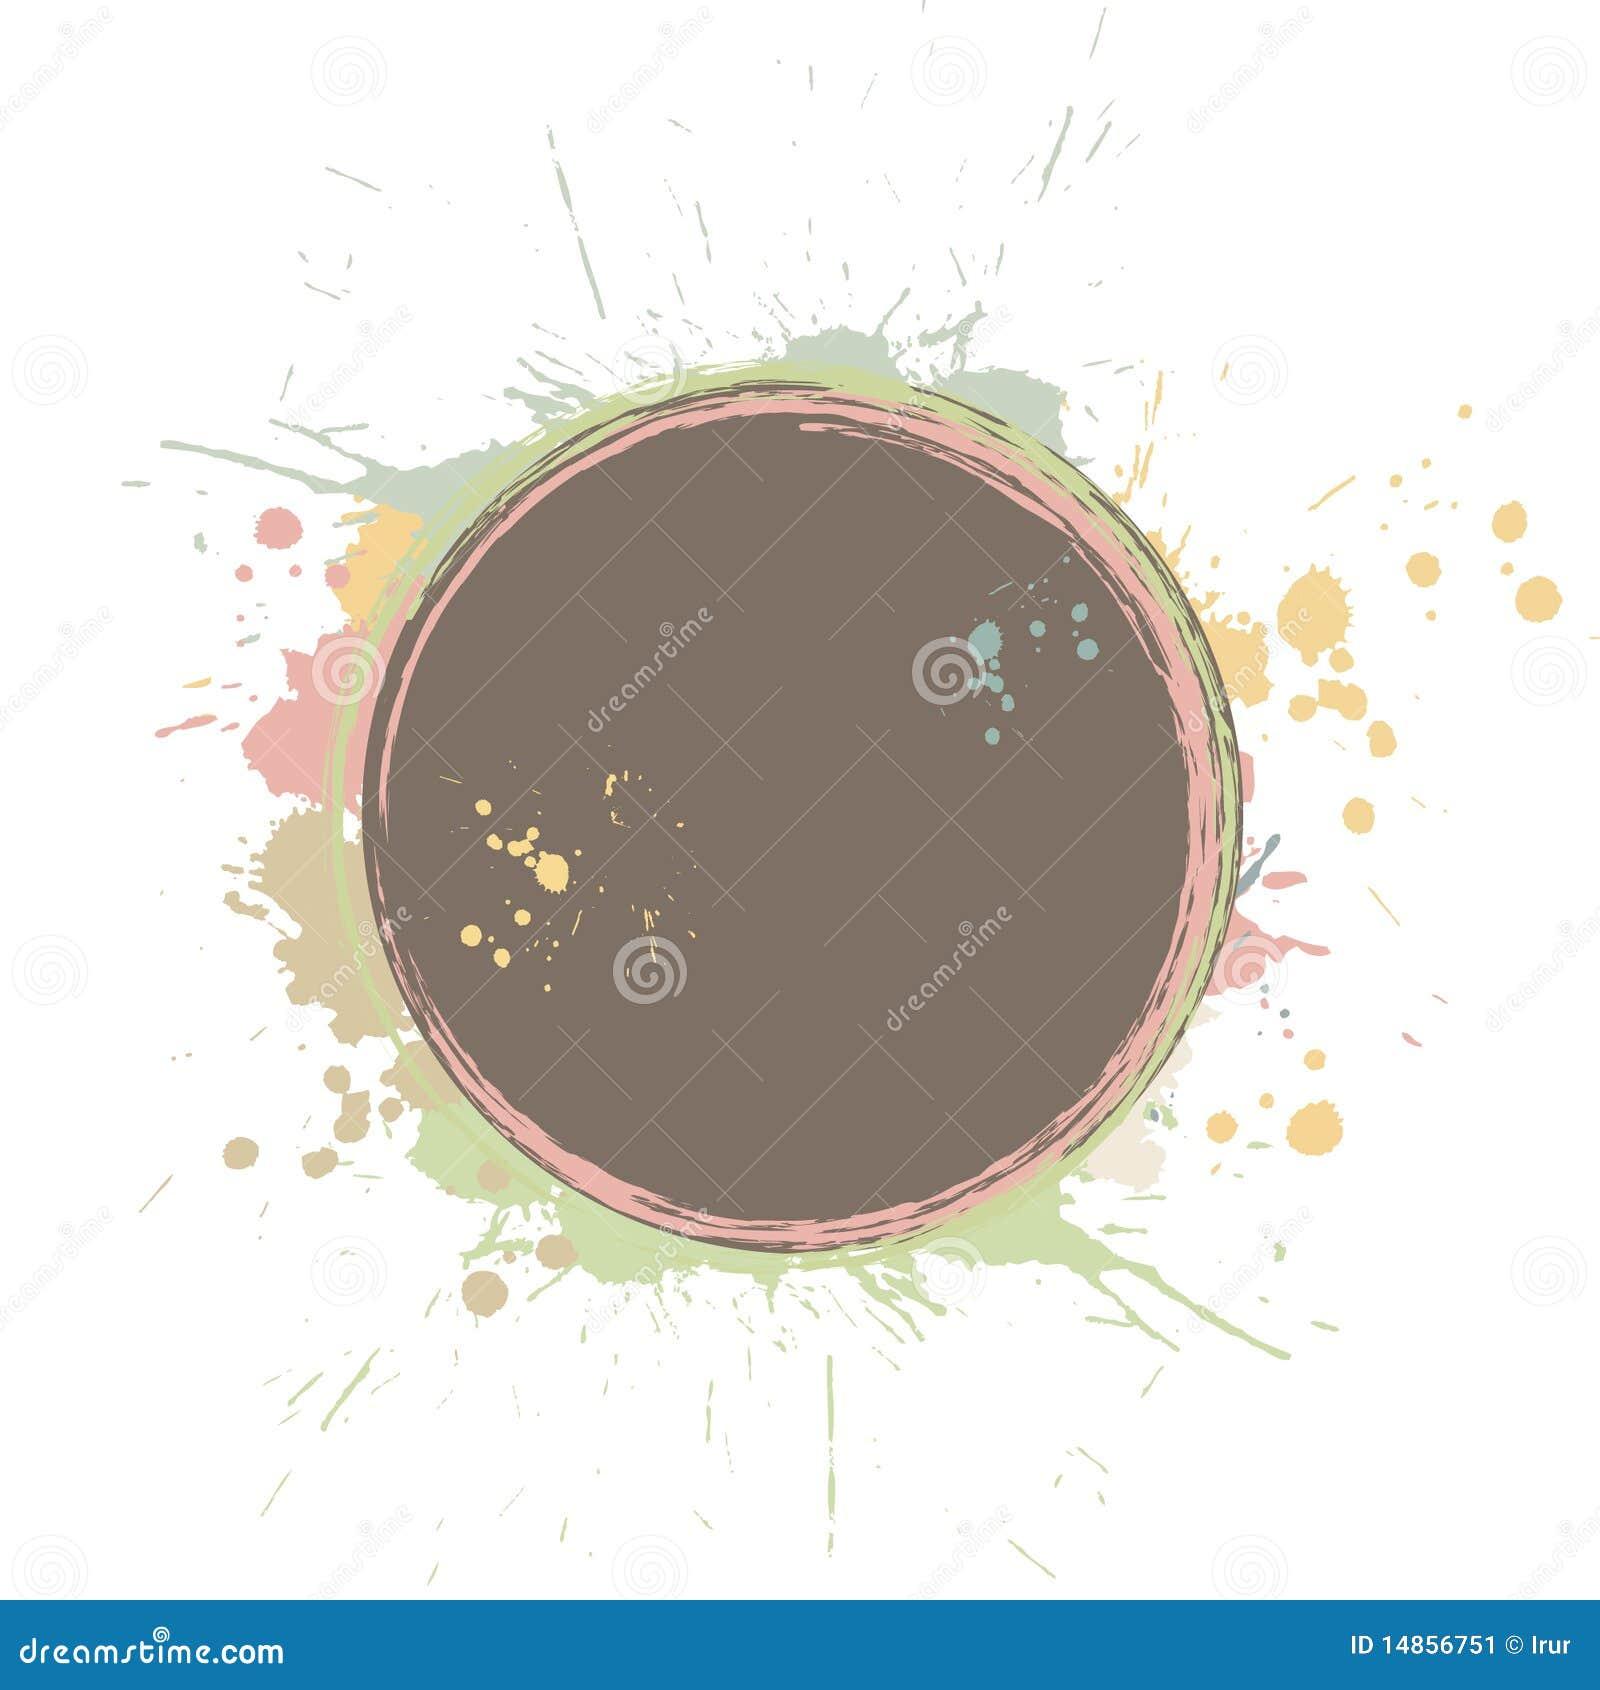 Grunge circle with splashes